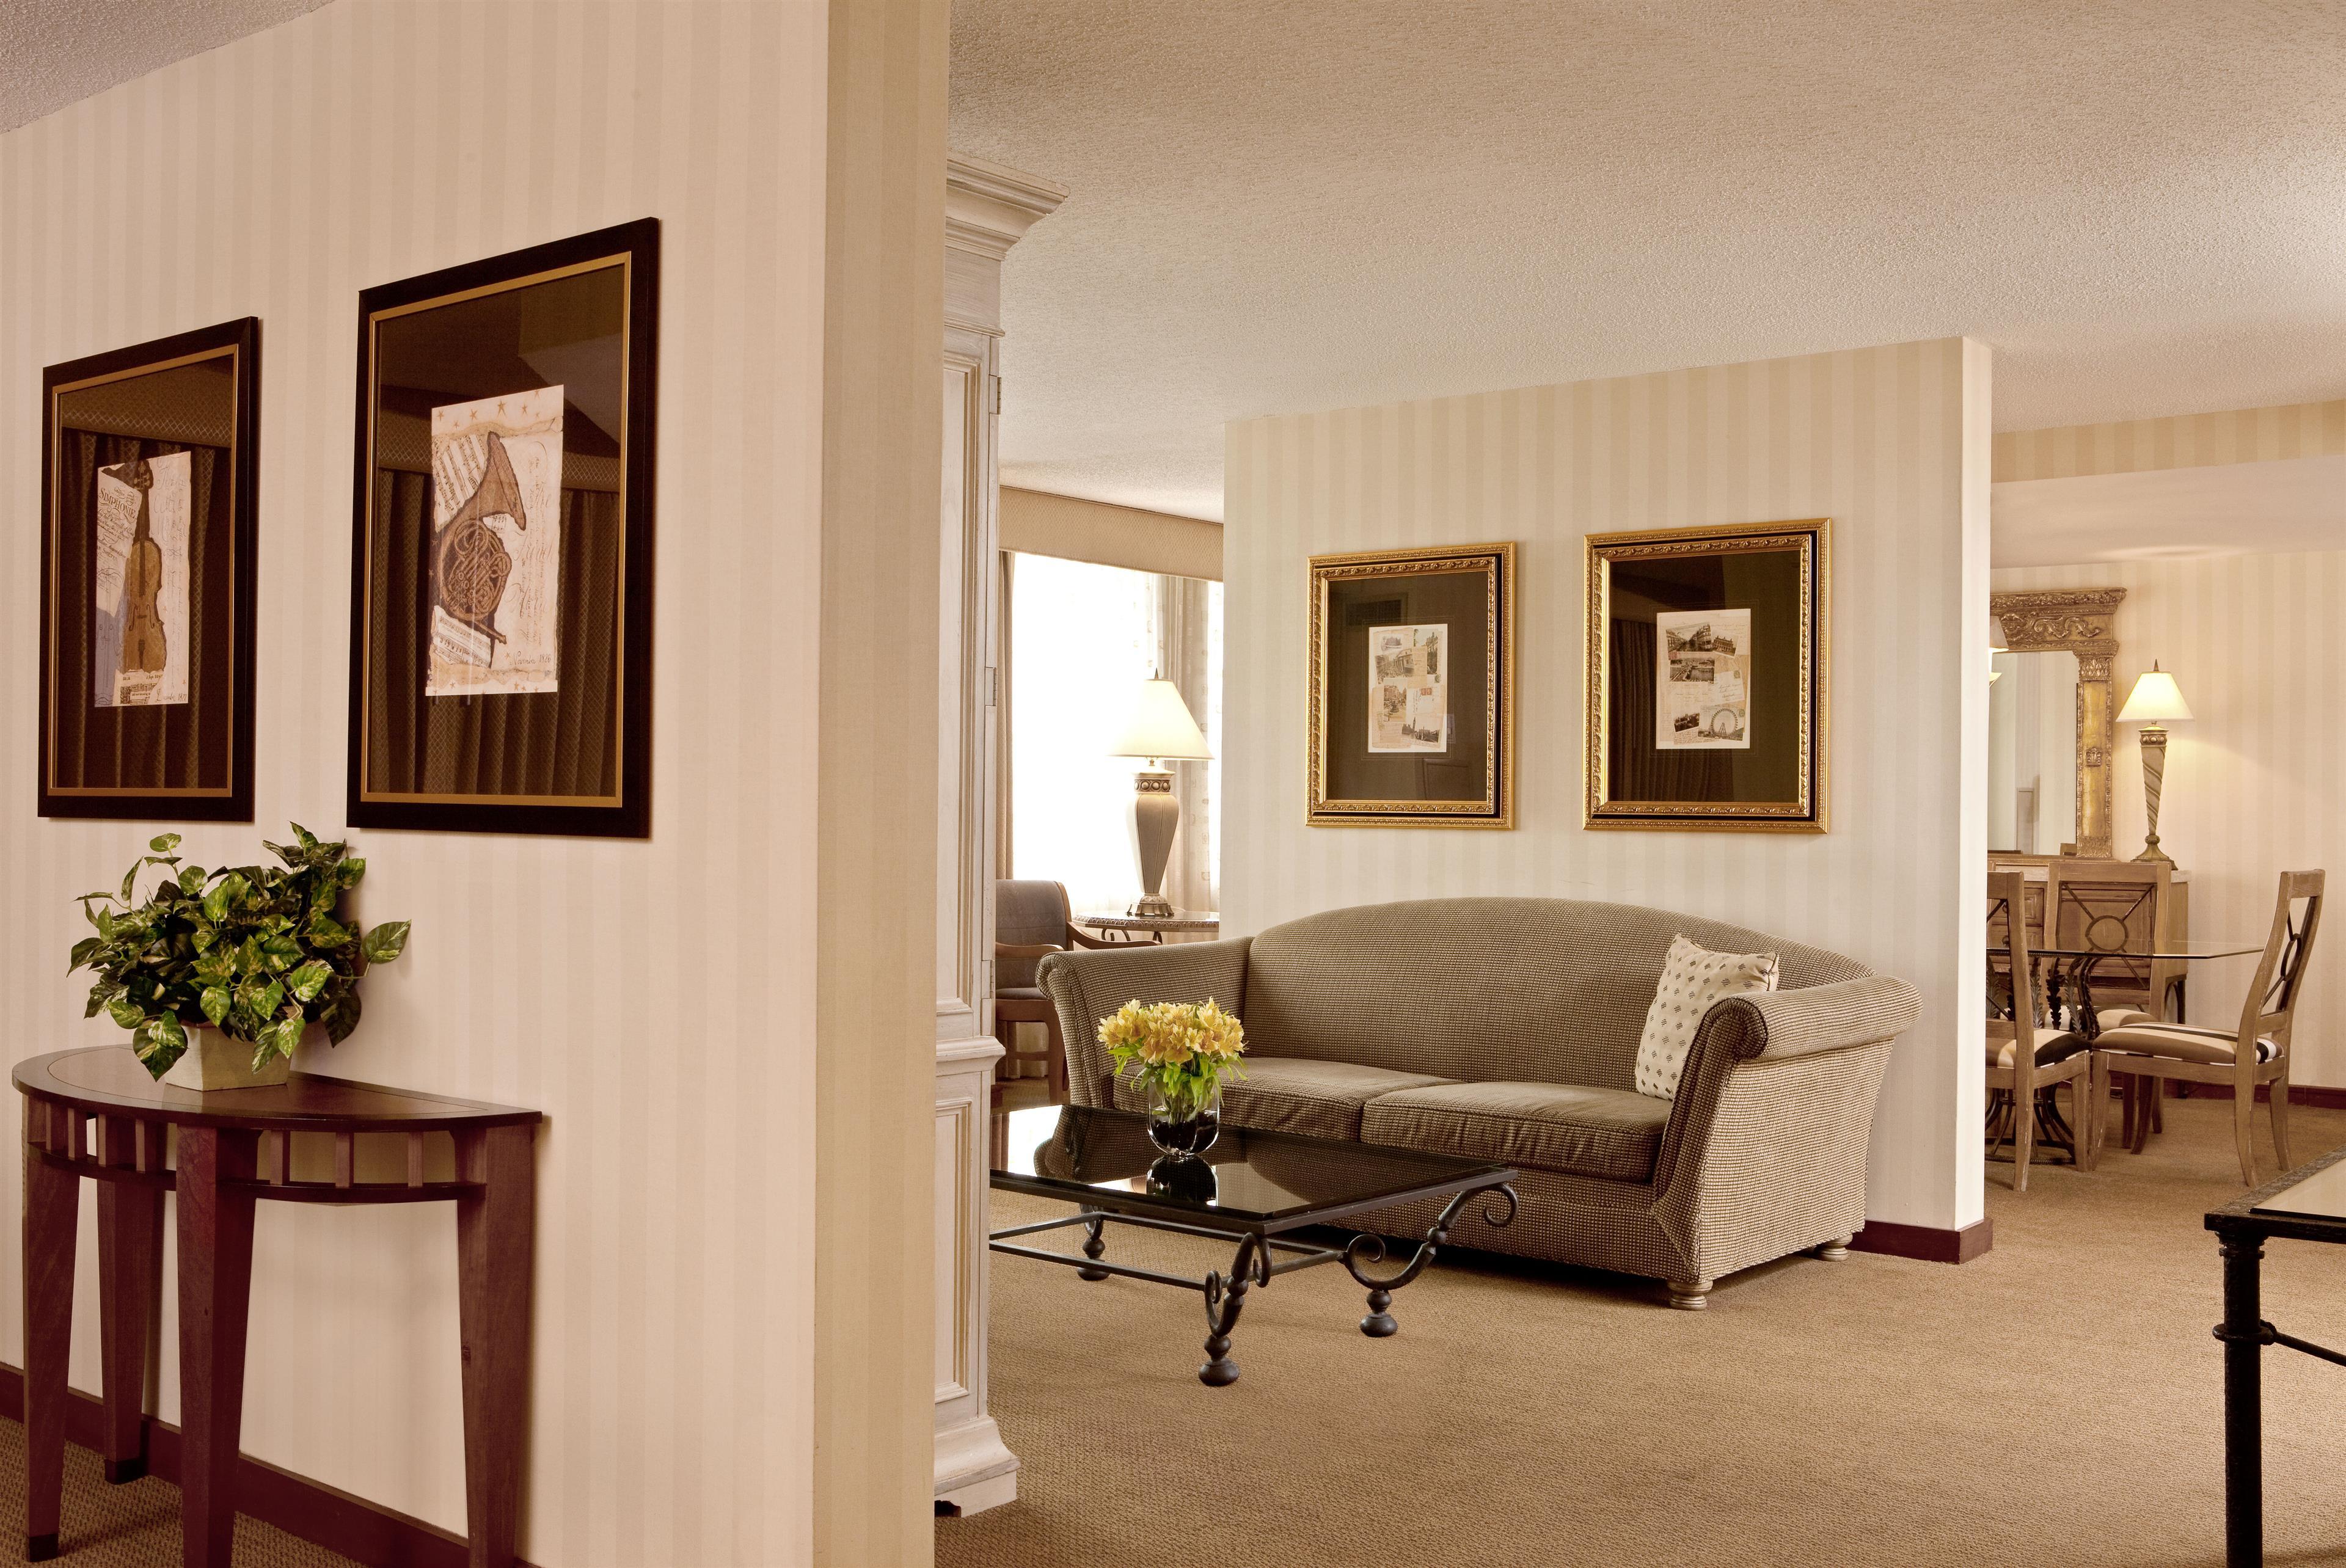 Sheraton Atlanta Airport Hotel image 5